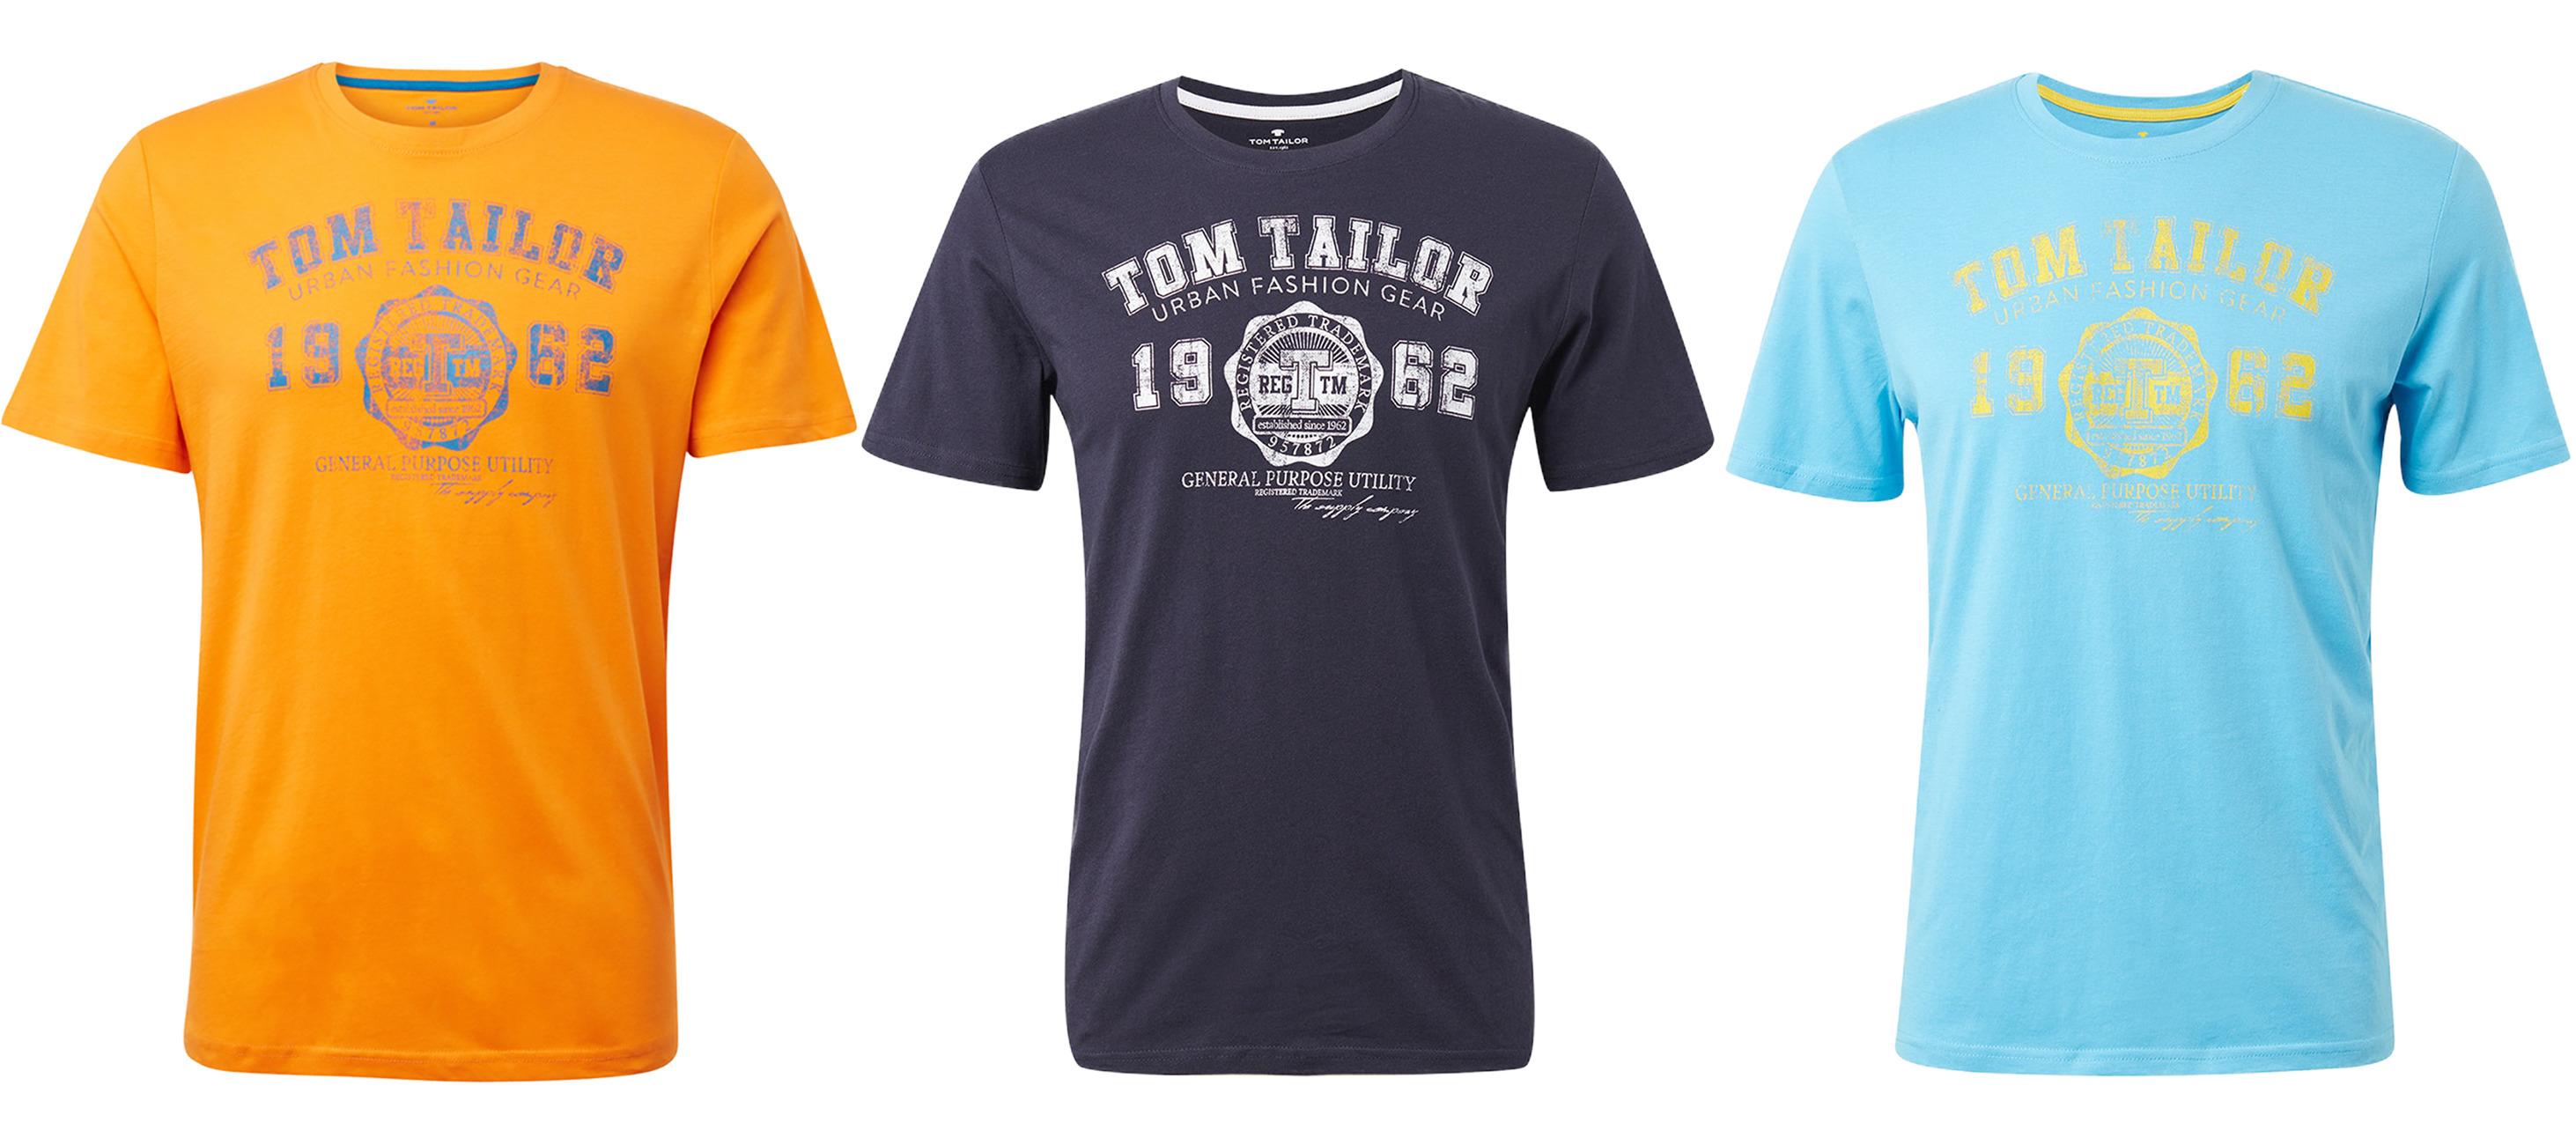 3 kaufen 2 bezahlen: Tom Tailor Logo T-Shirt Regular Fit (versch. Farben. Gr. S-XXL, 100% Baumwolle)